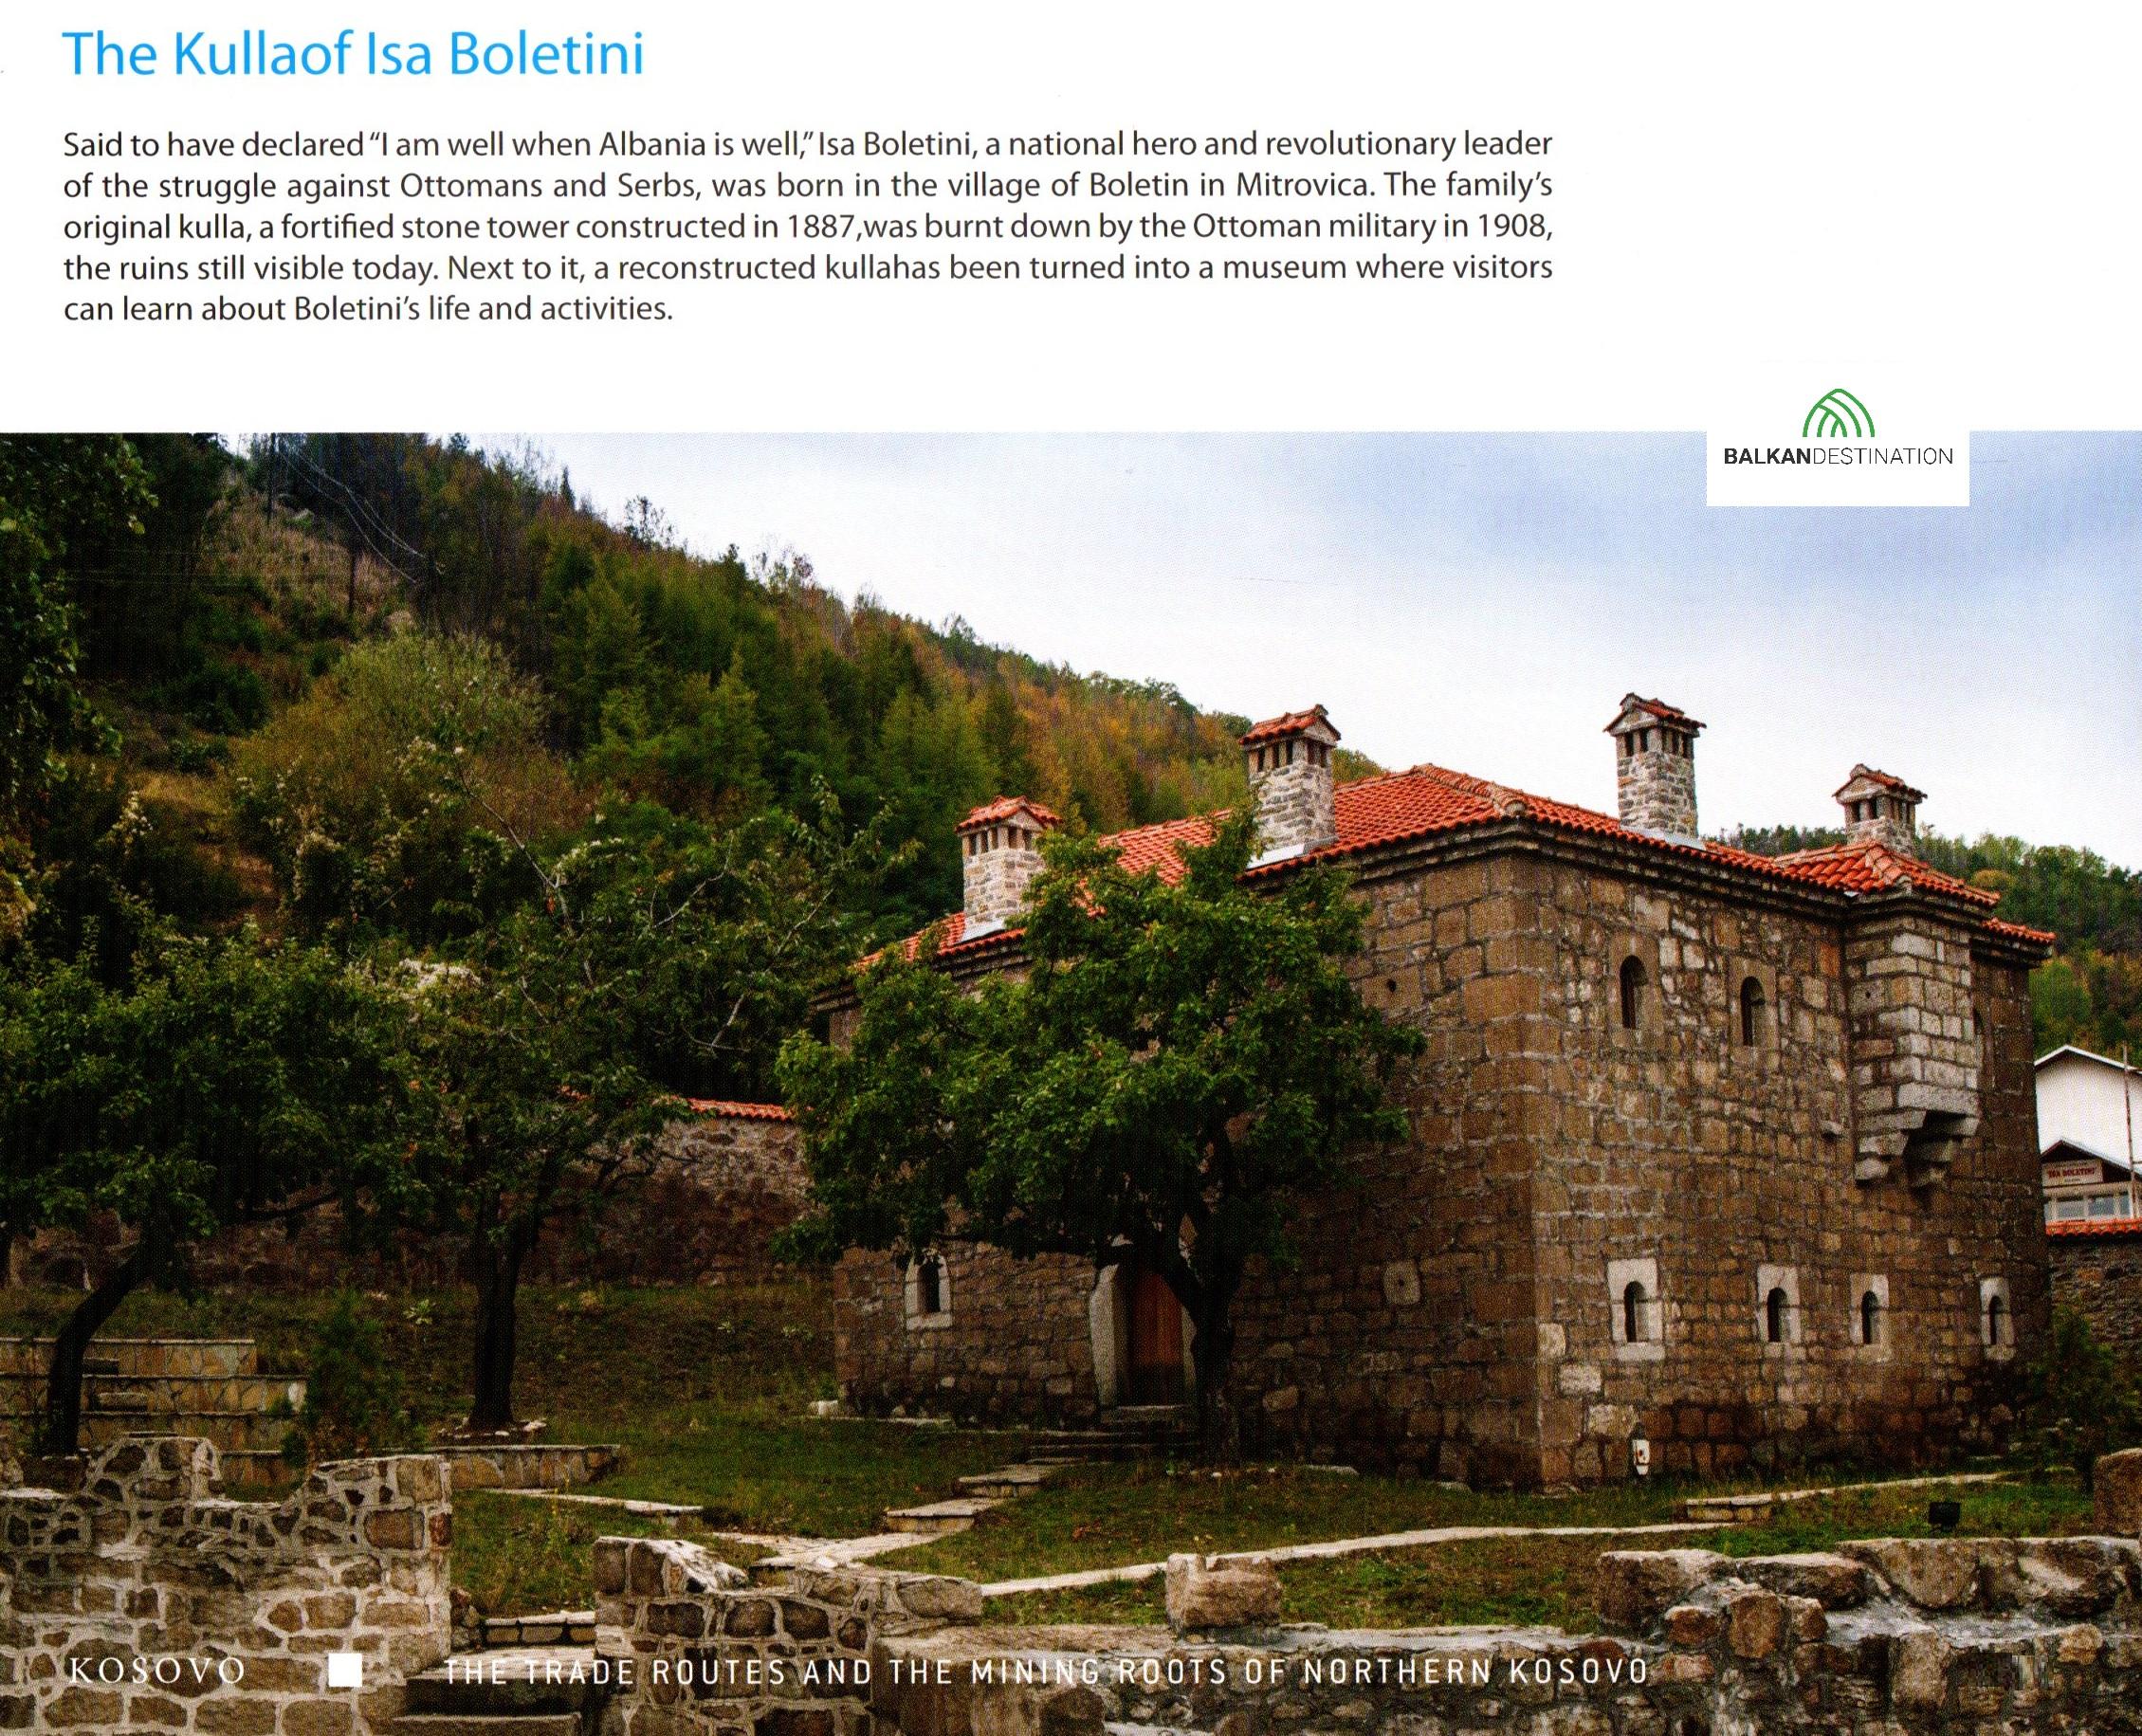 ISA Boletin tower Kulla mitrovica balkandestination